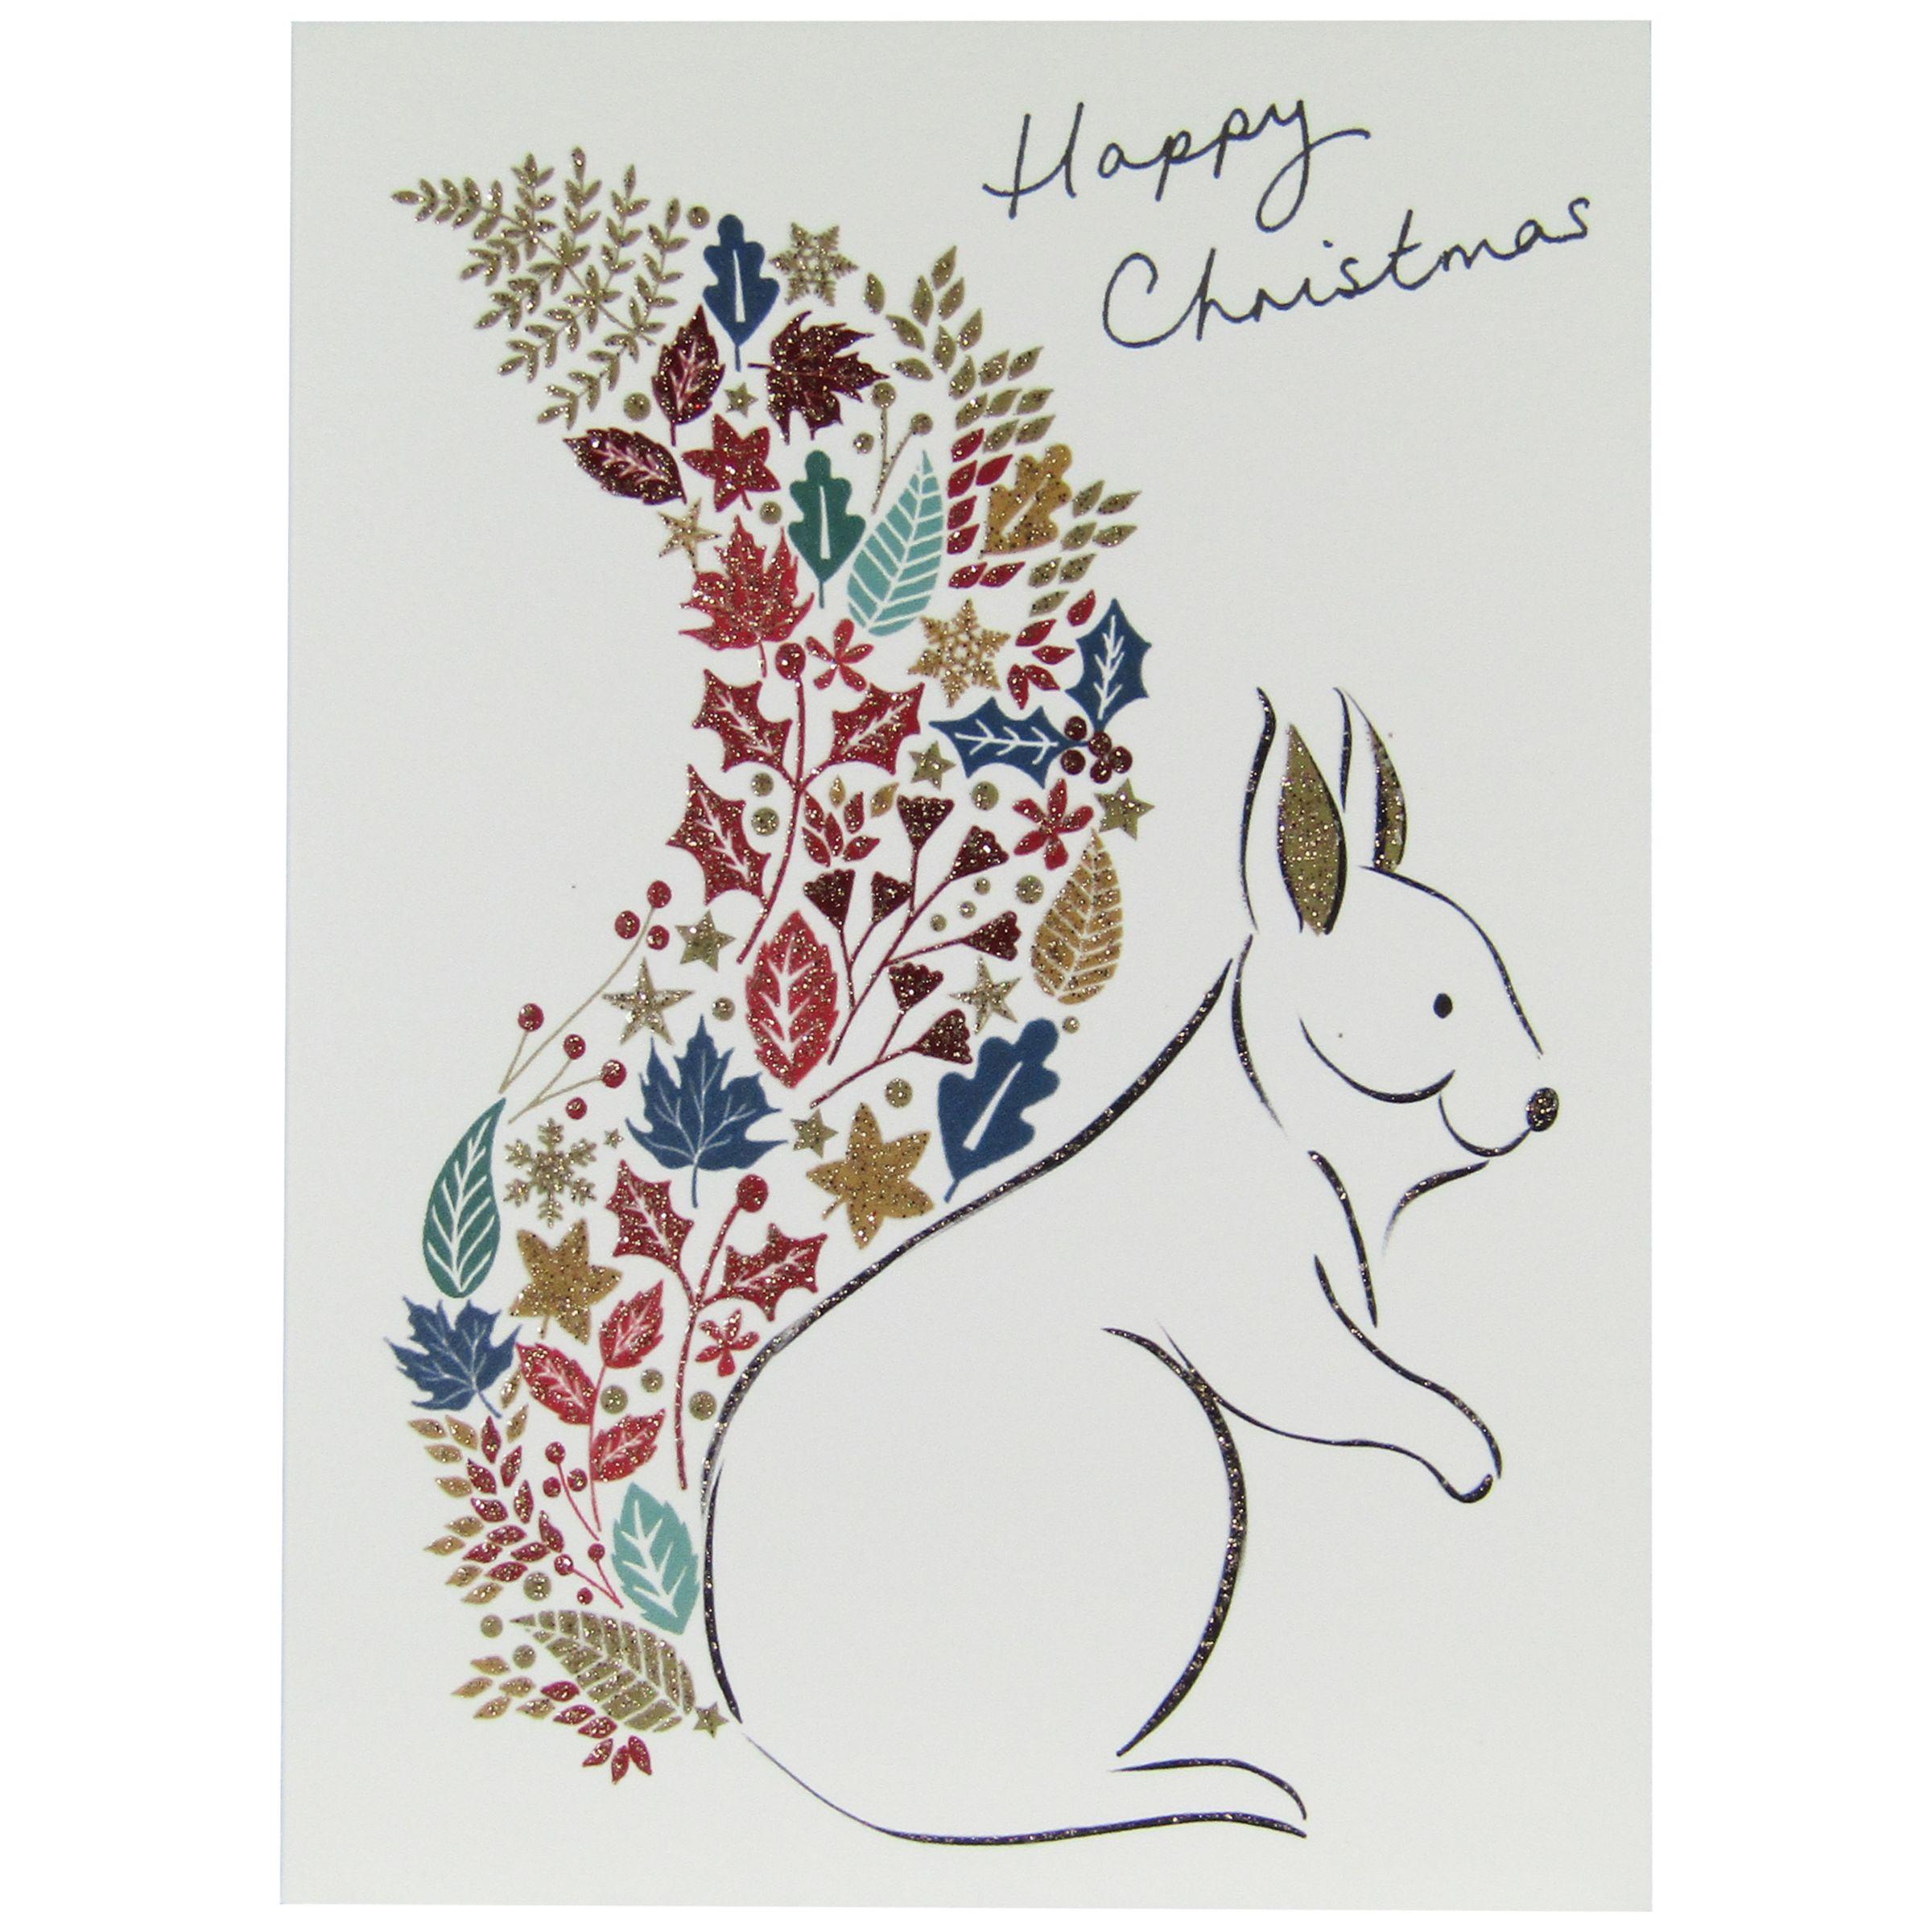 Woodmansterne Woodmansterne The Nutcracker Charity Christmas Cards, Pack of 5